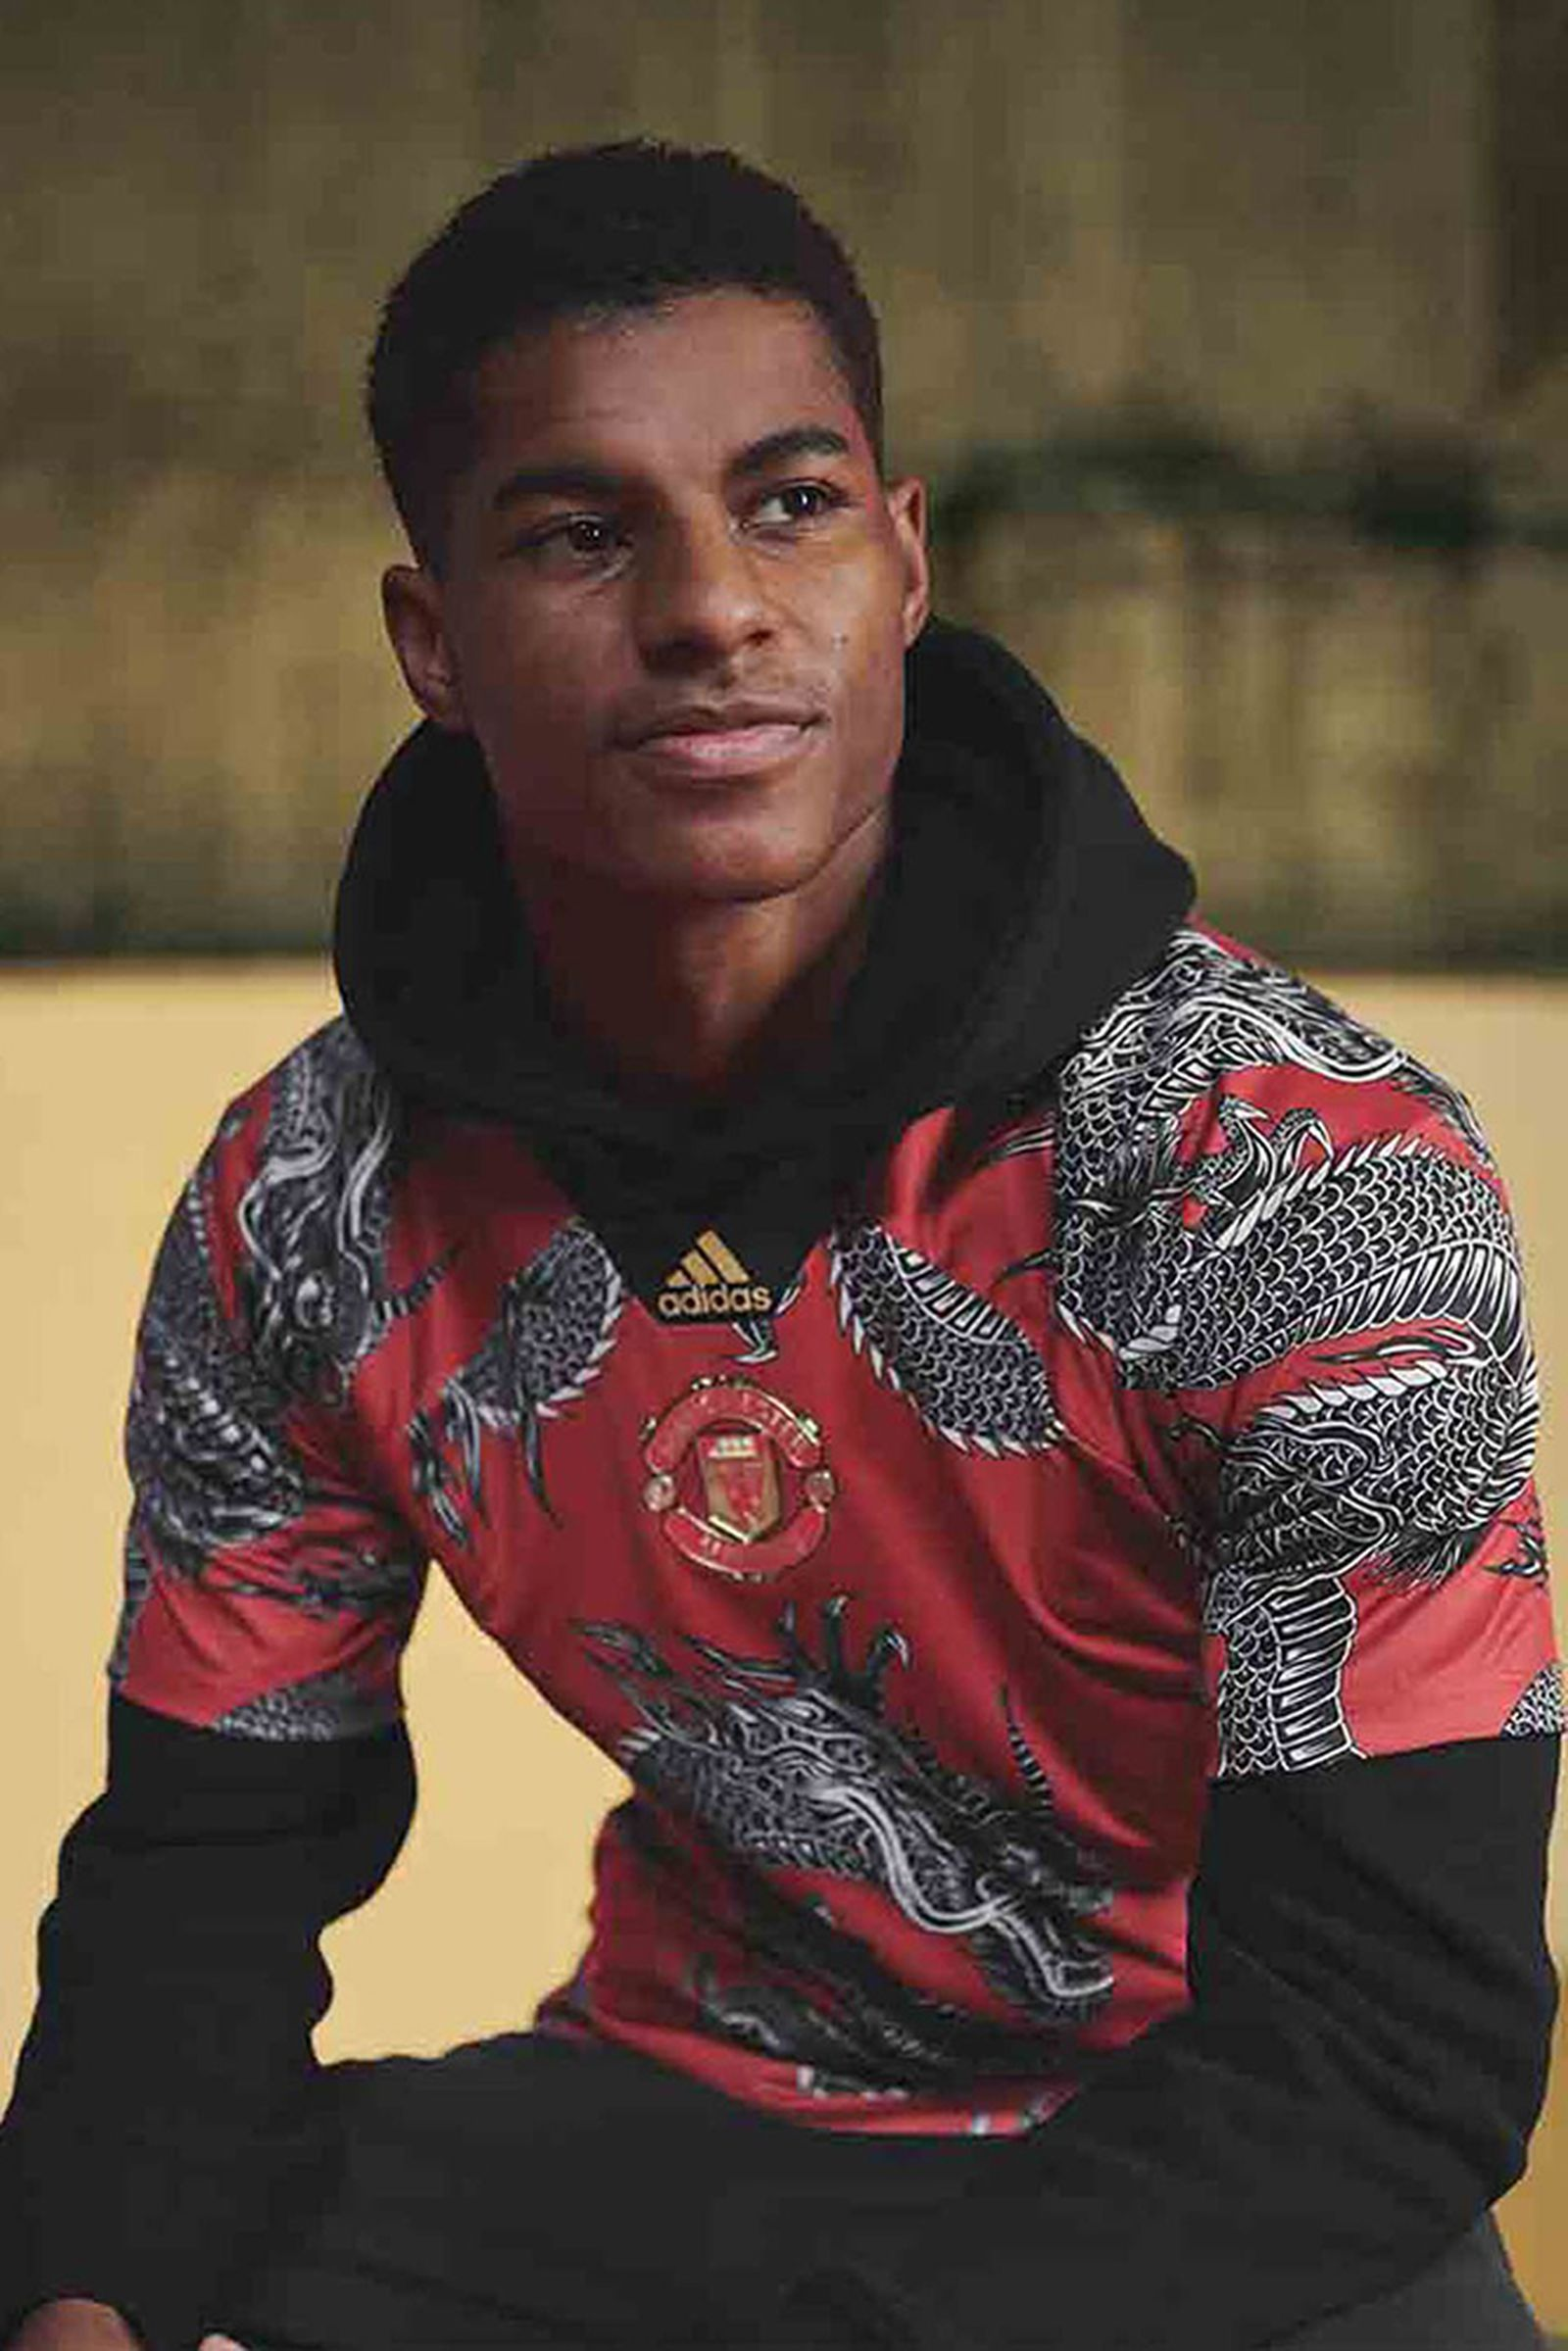 manchester united jersey china